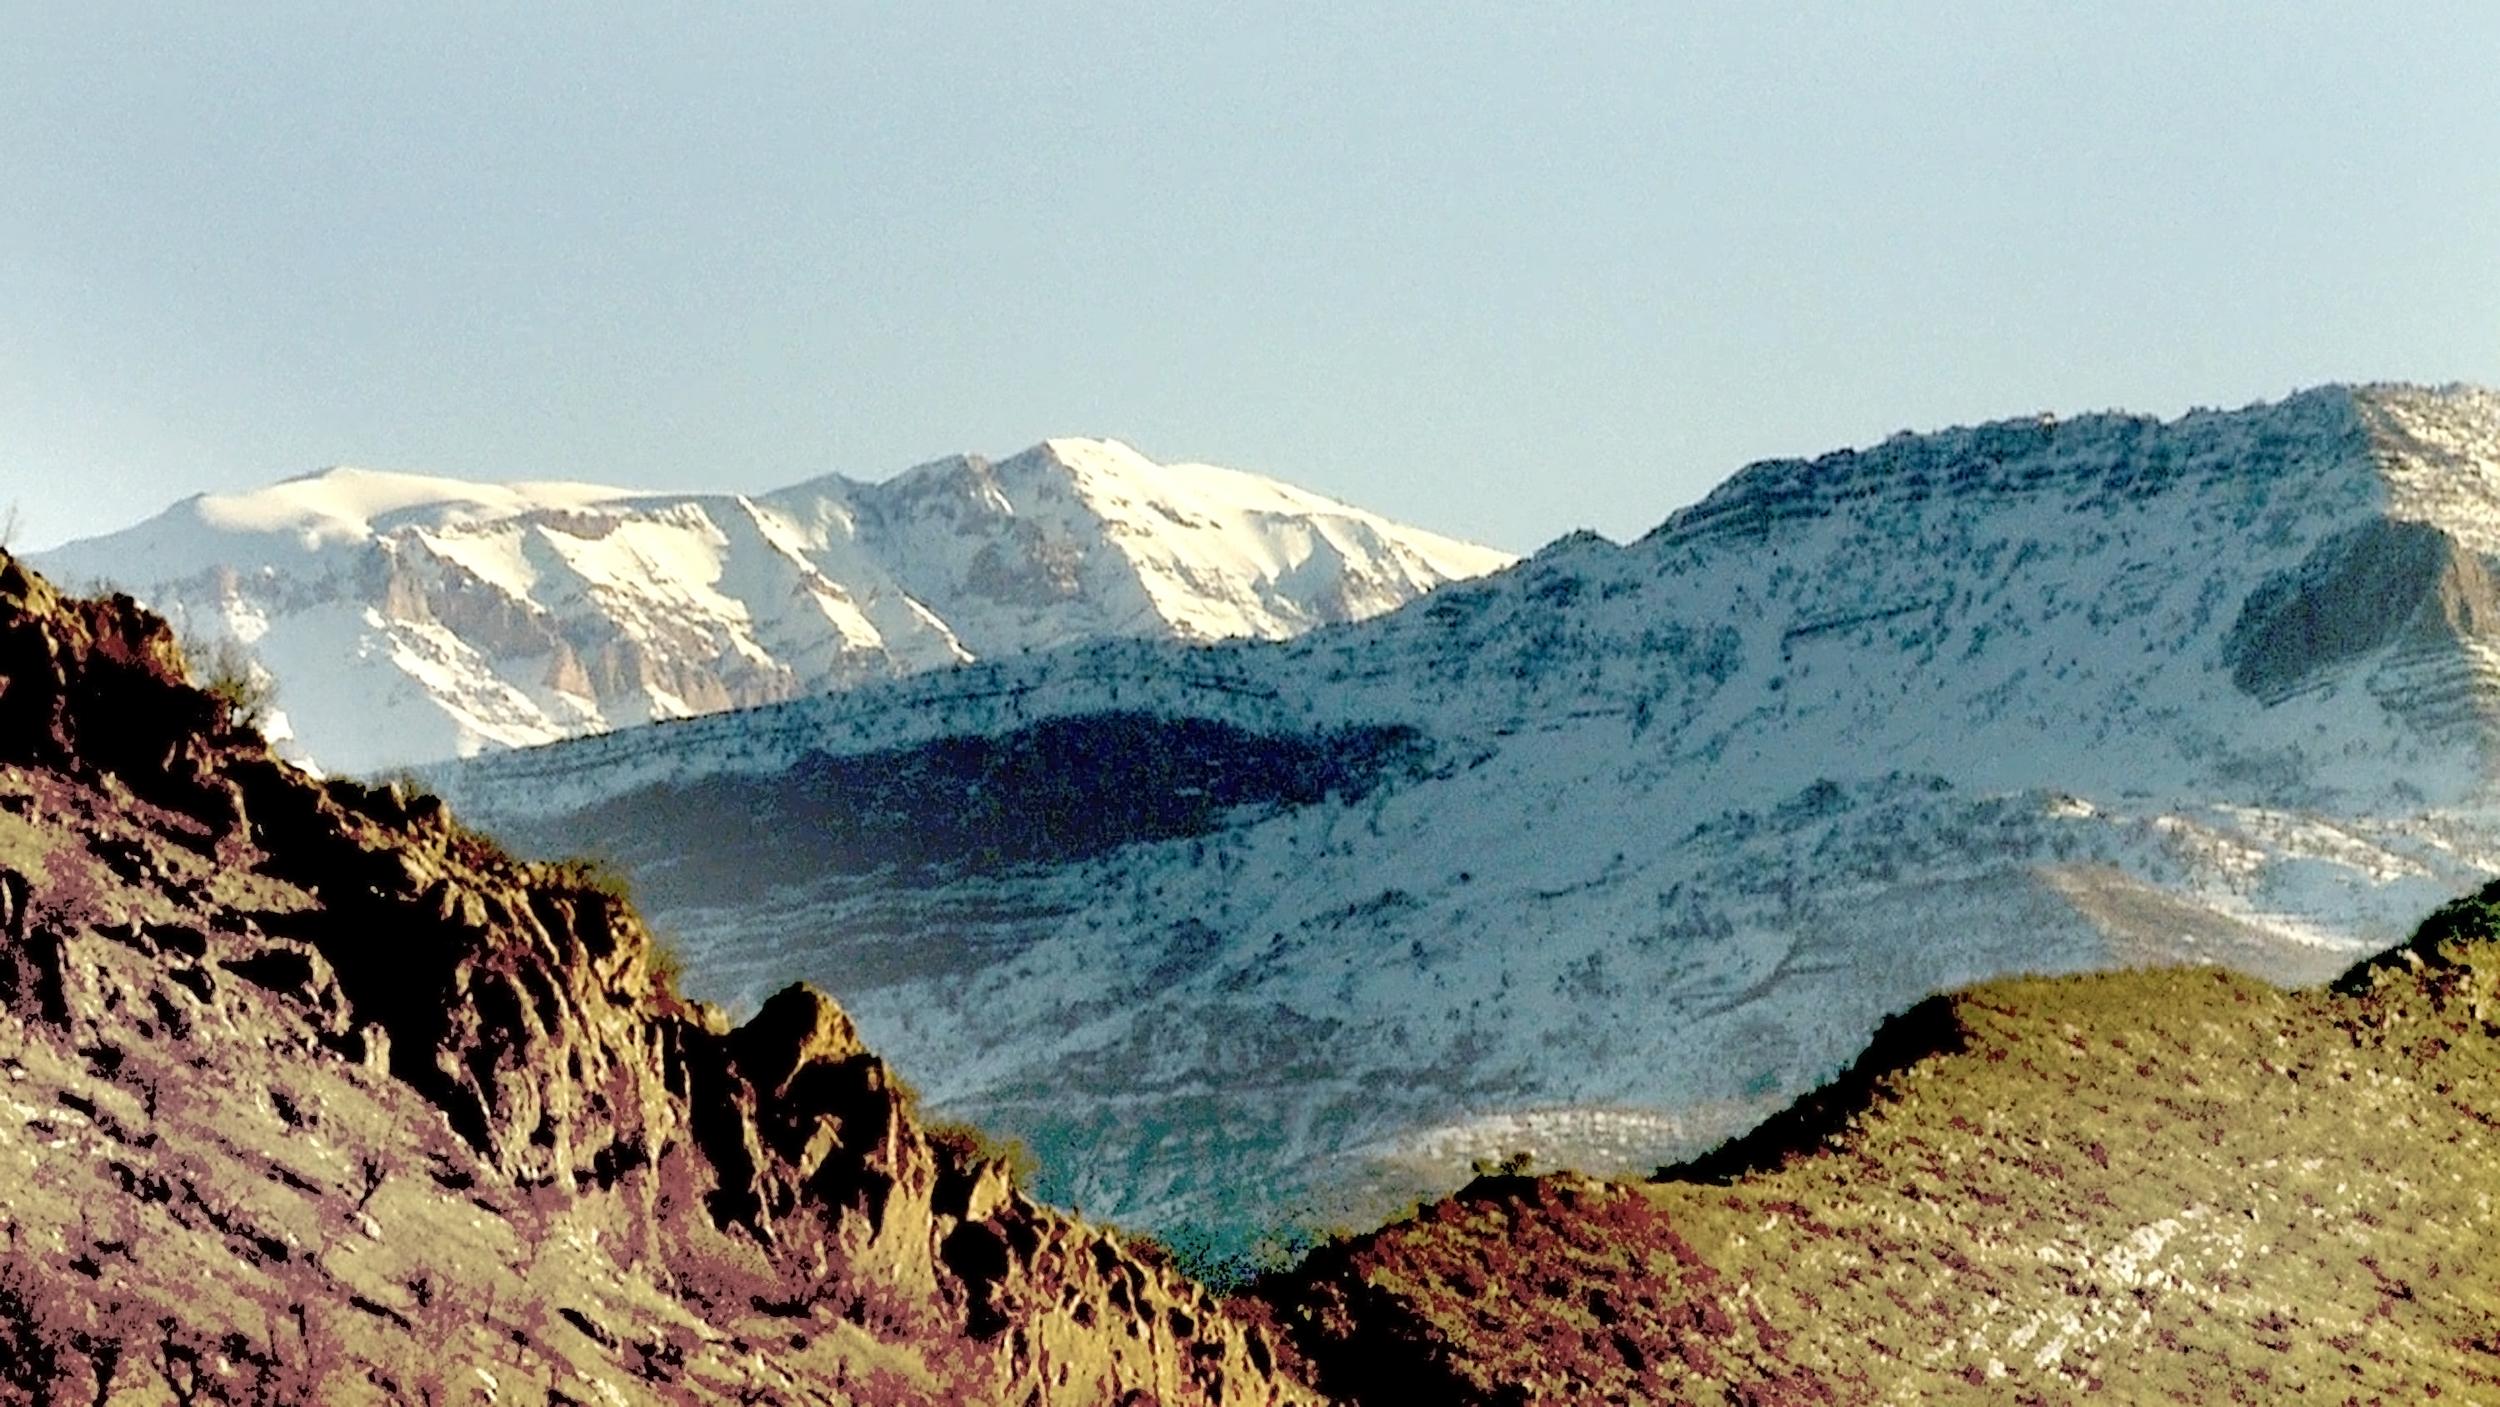 160301_blog_iraq_mountain